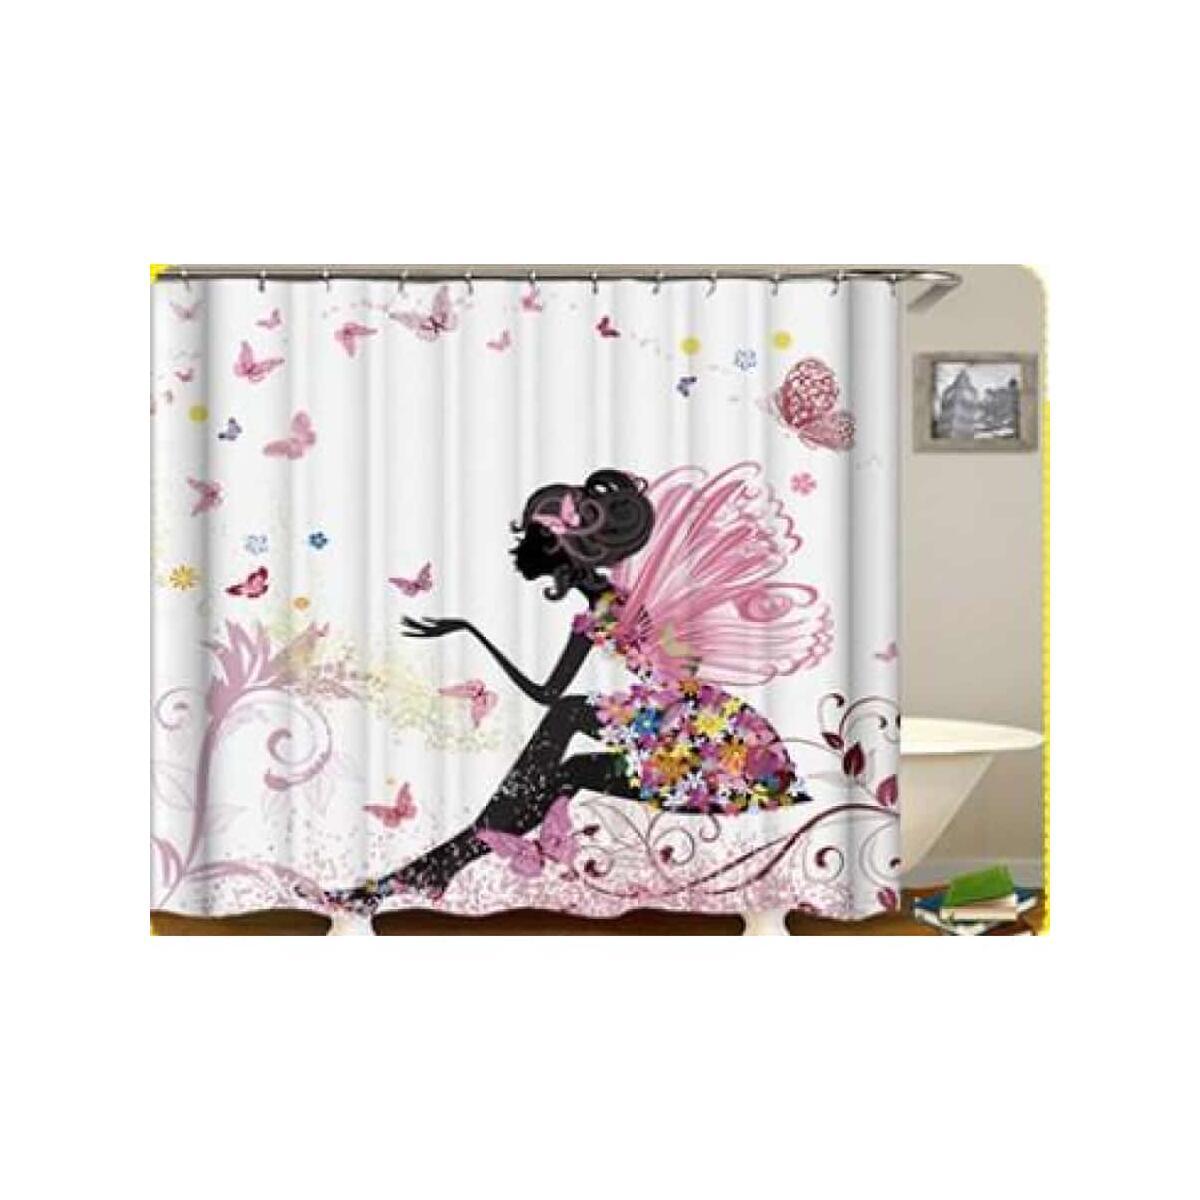 African Queen shower curtain, 165x180 / yl0580#